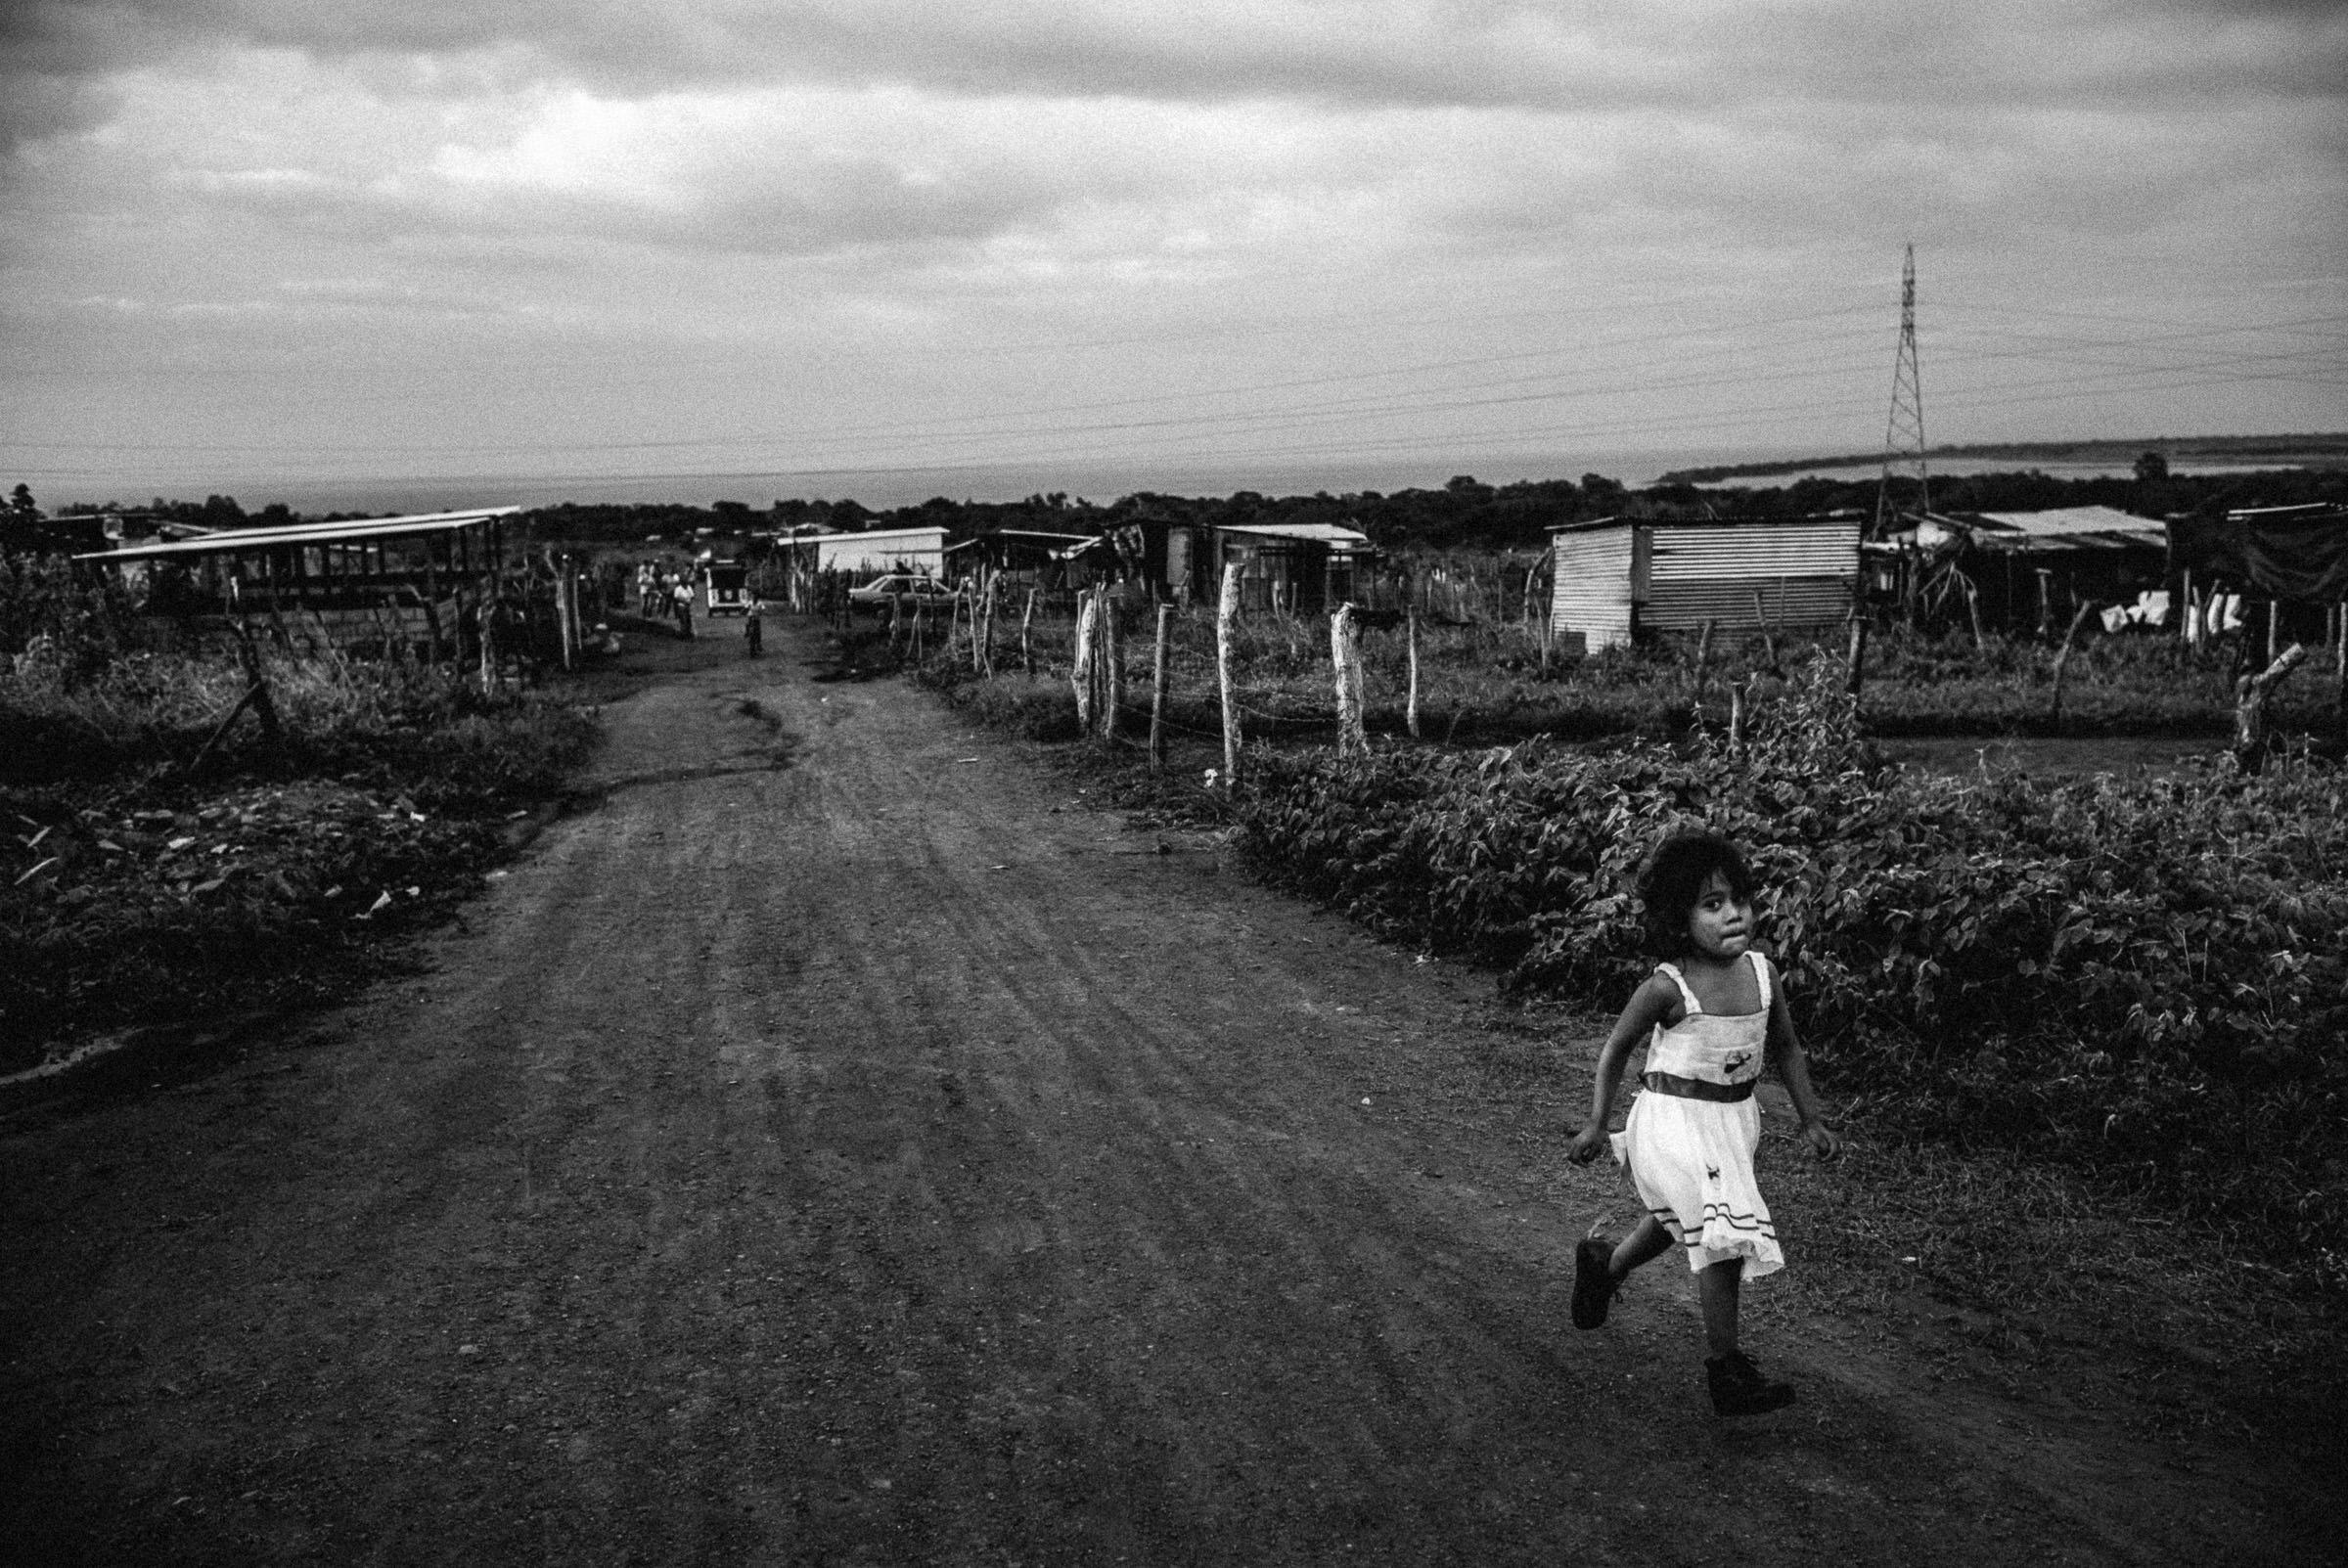 brandon_patoc_travel_photographer_in_nicaragua_0002.JPG